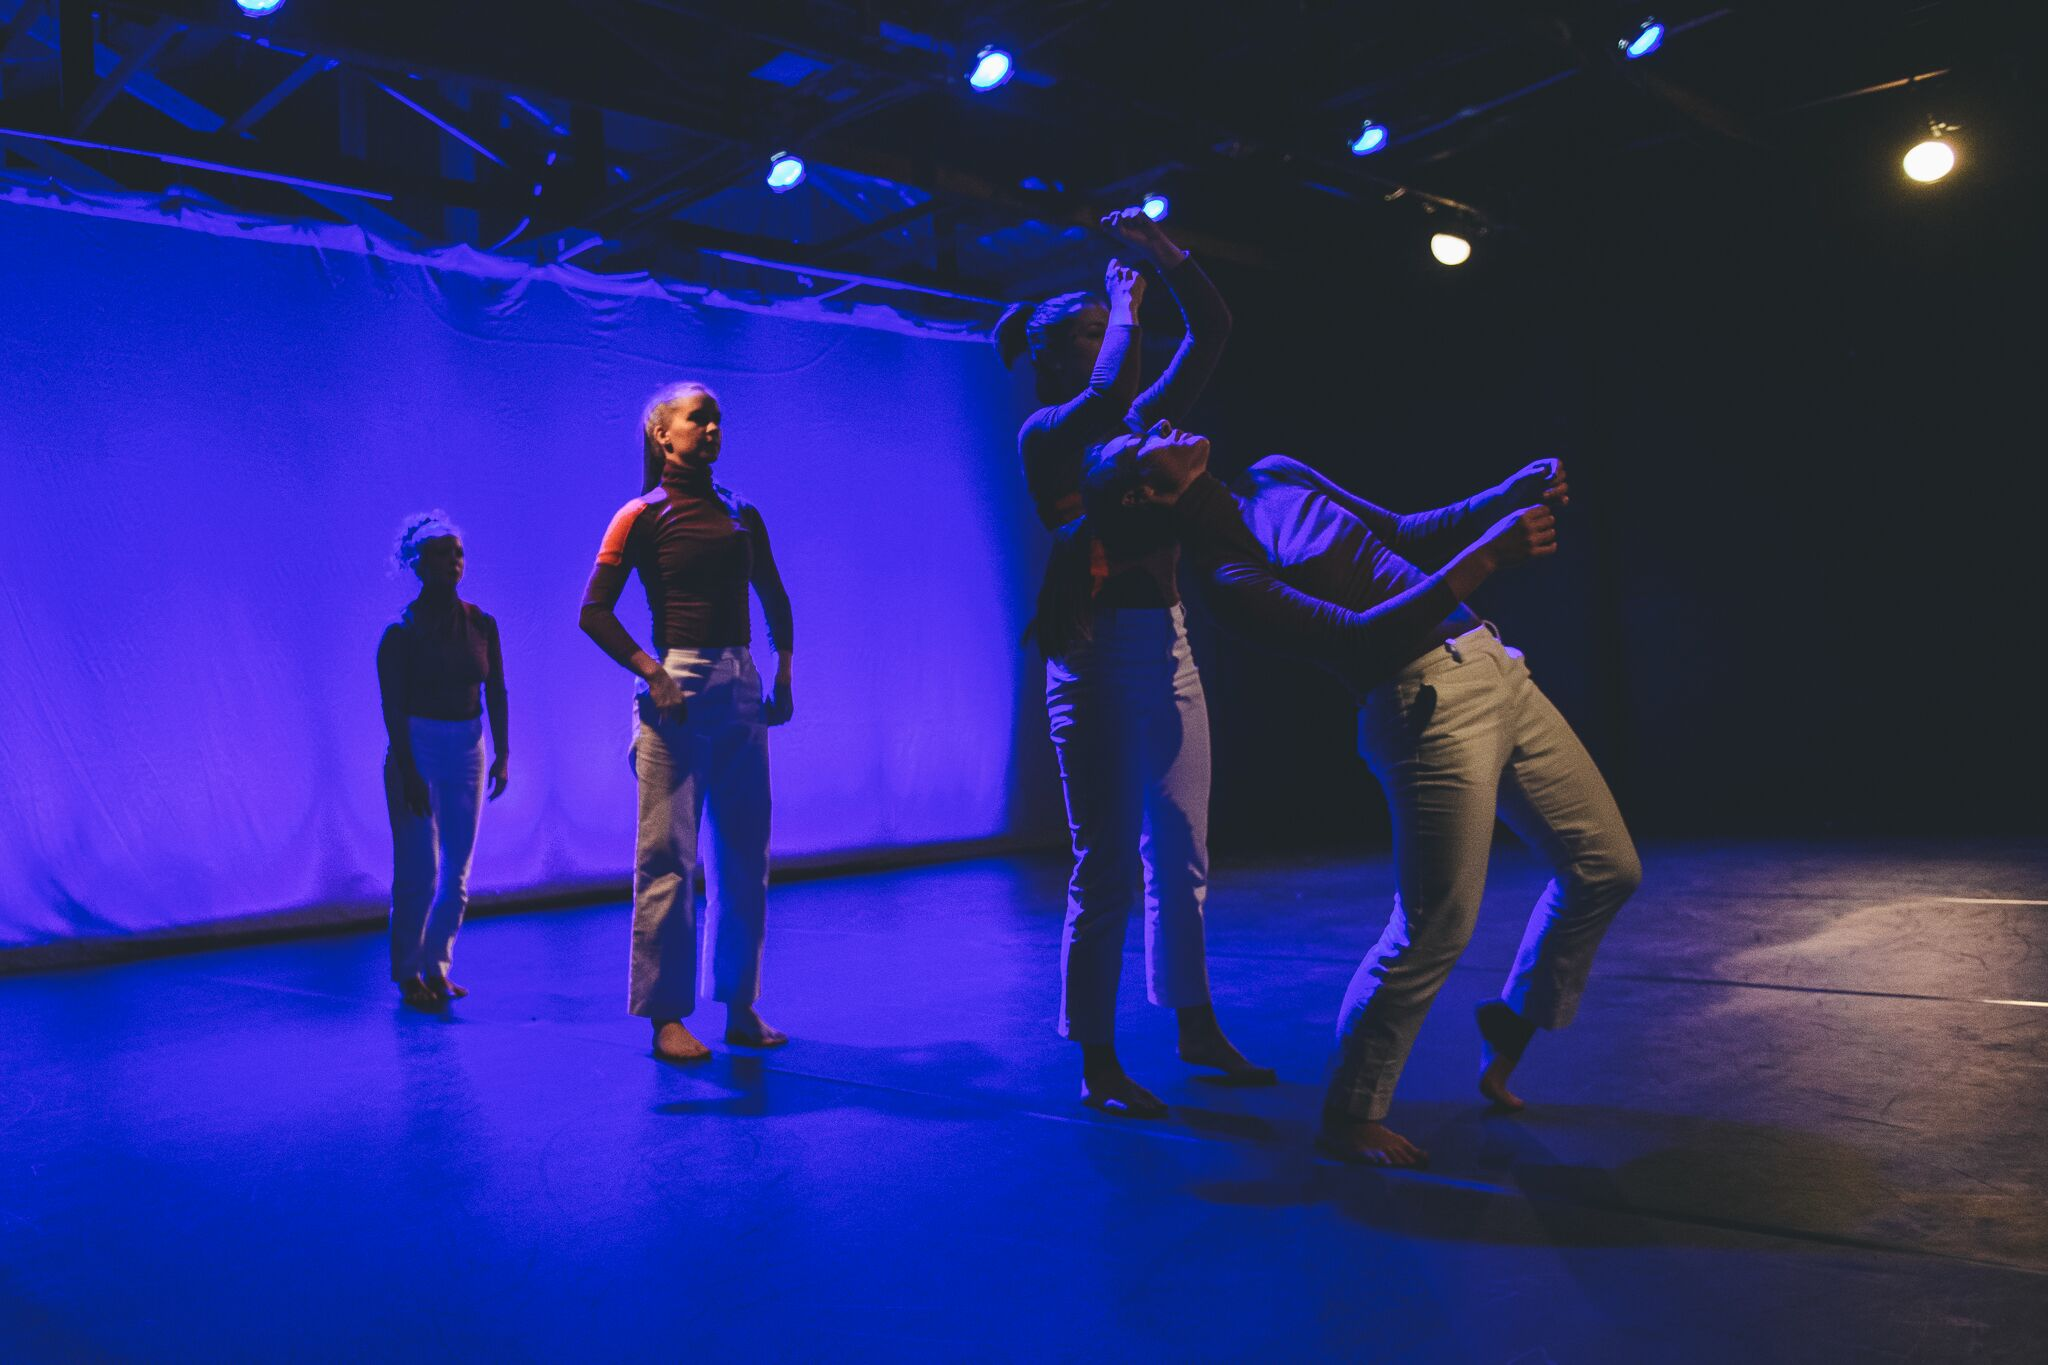 Dancers: Hailley Laurèn, Lucy Wilson, Taryn Lavery, Alex Miller